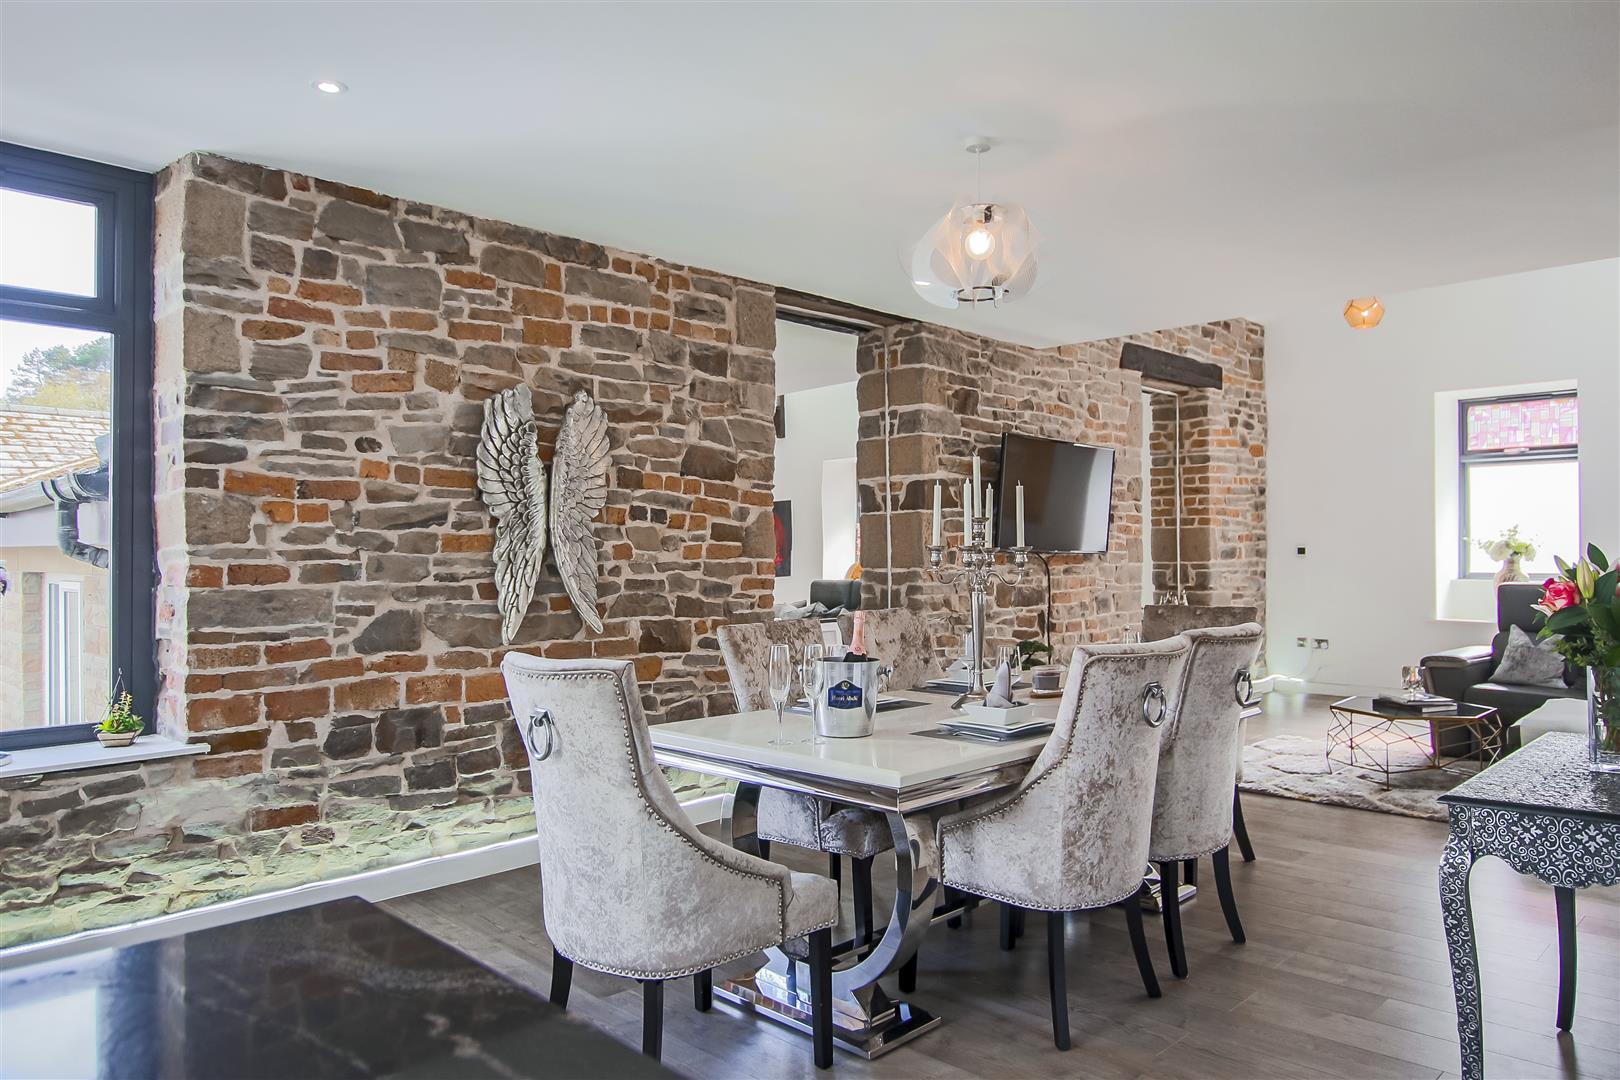 3 Bedroom Duplex Apartment For Sale - Image 28